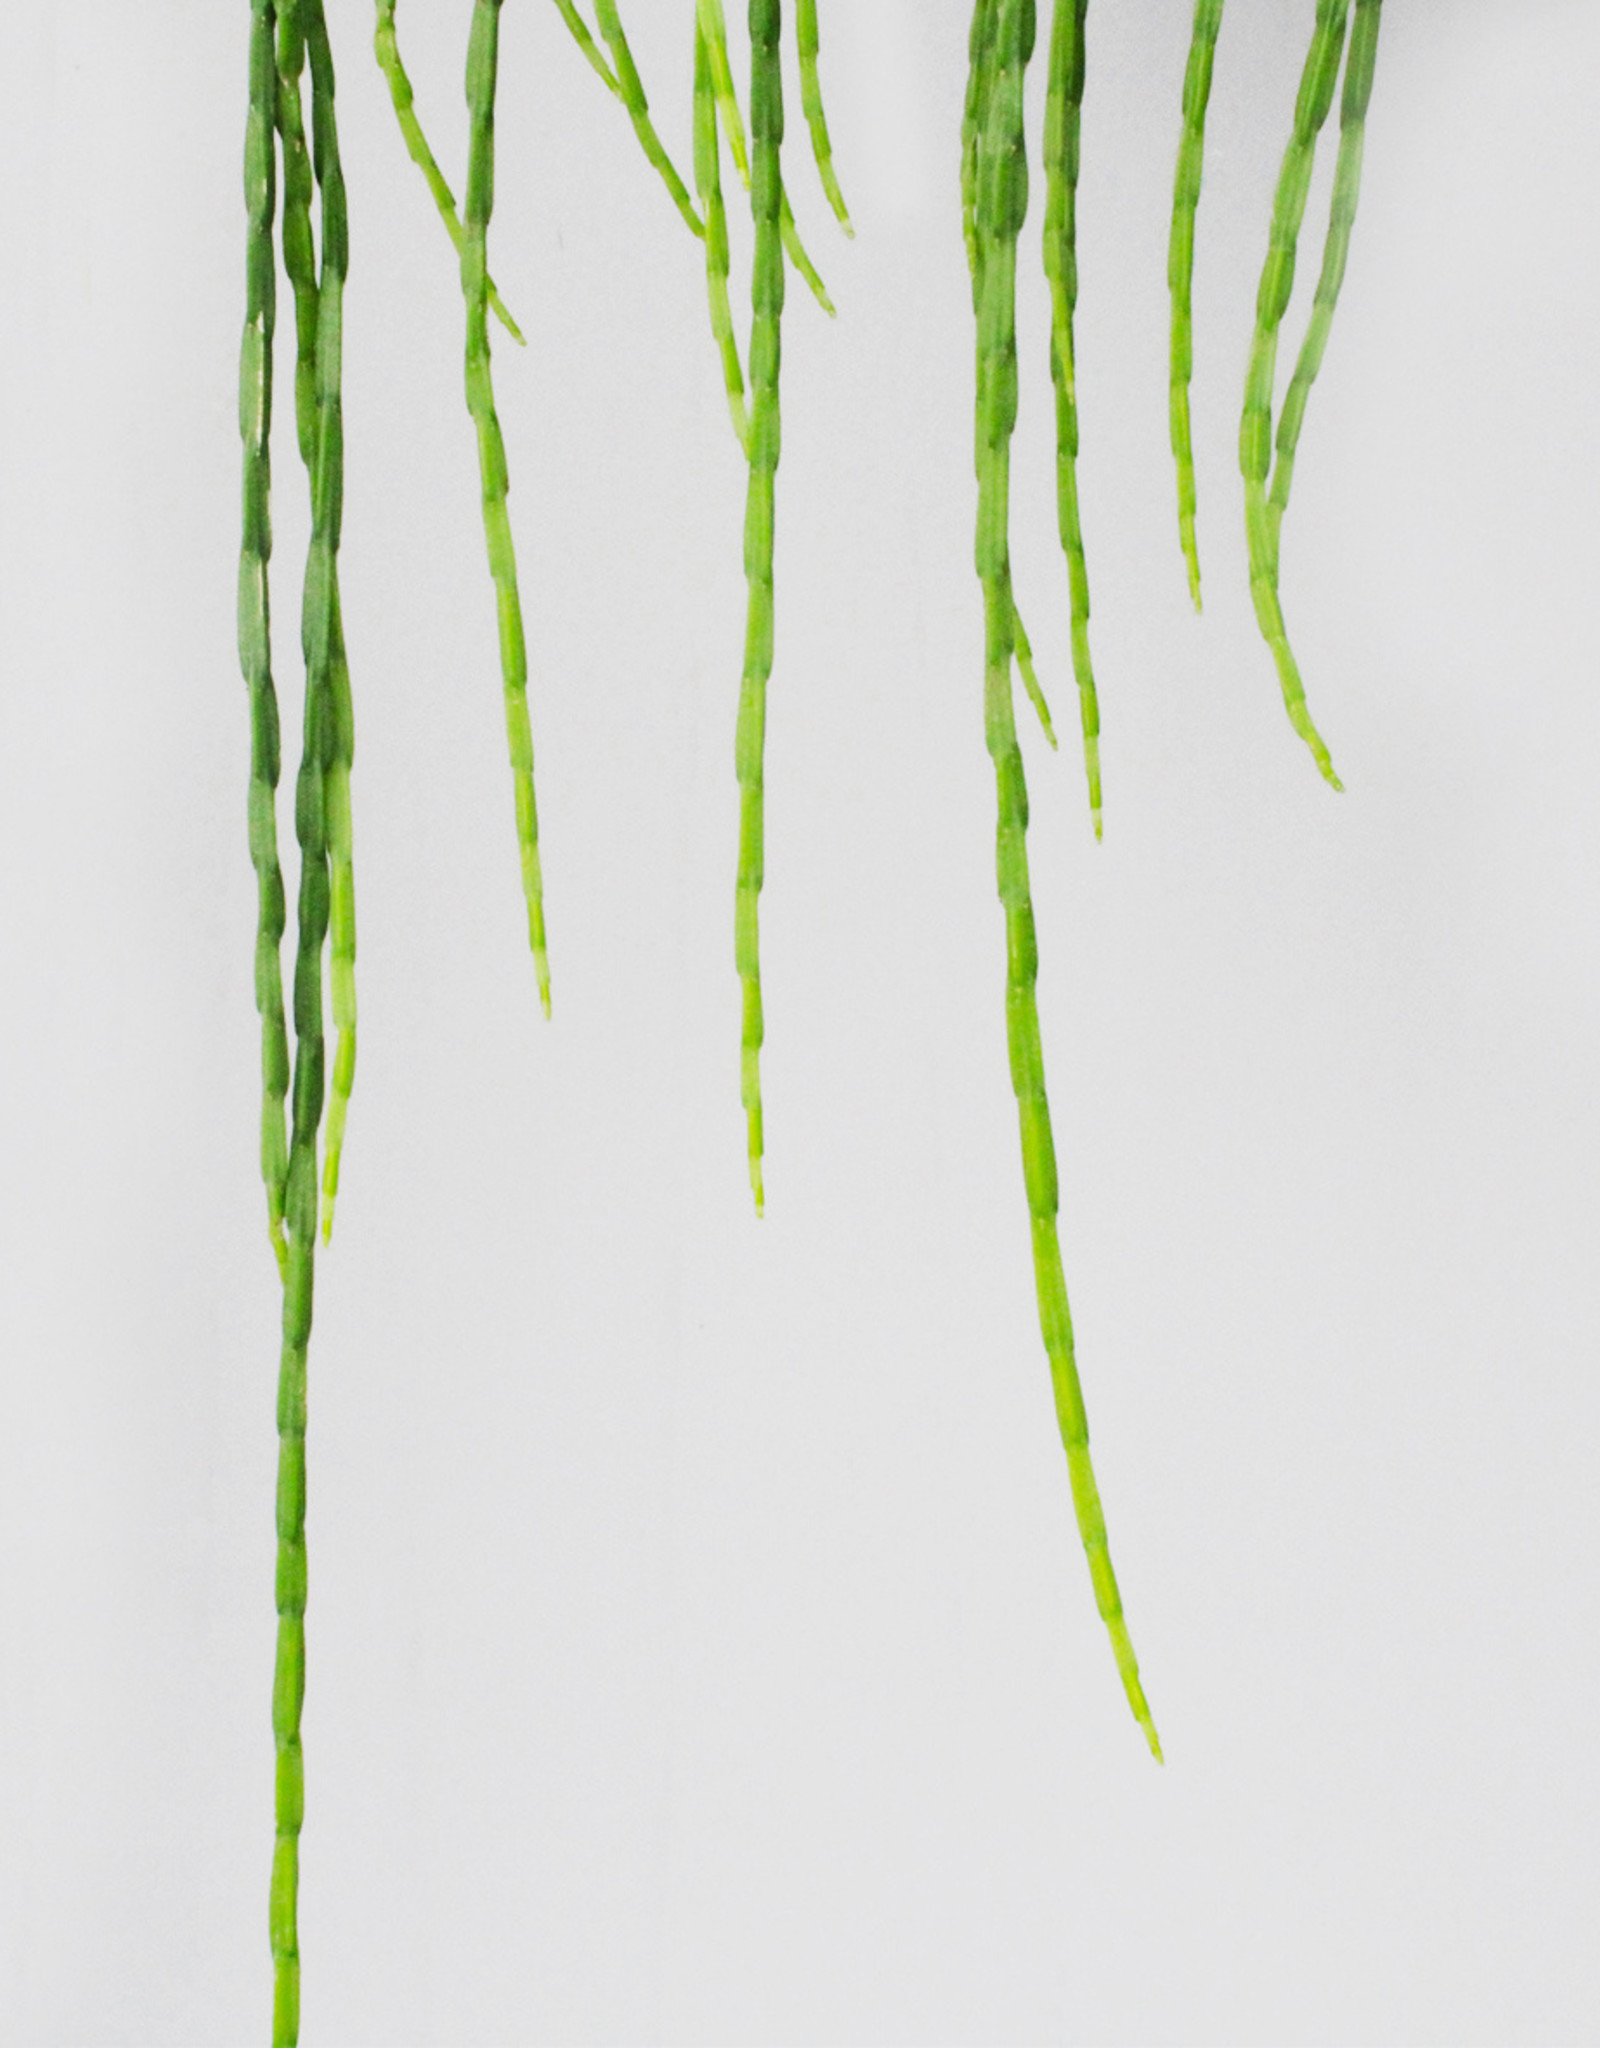 Rhipsalis paradoxa fijn - Koraalcactus